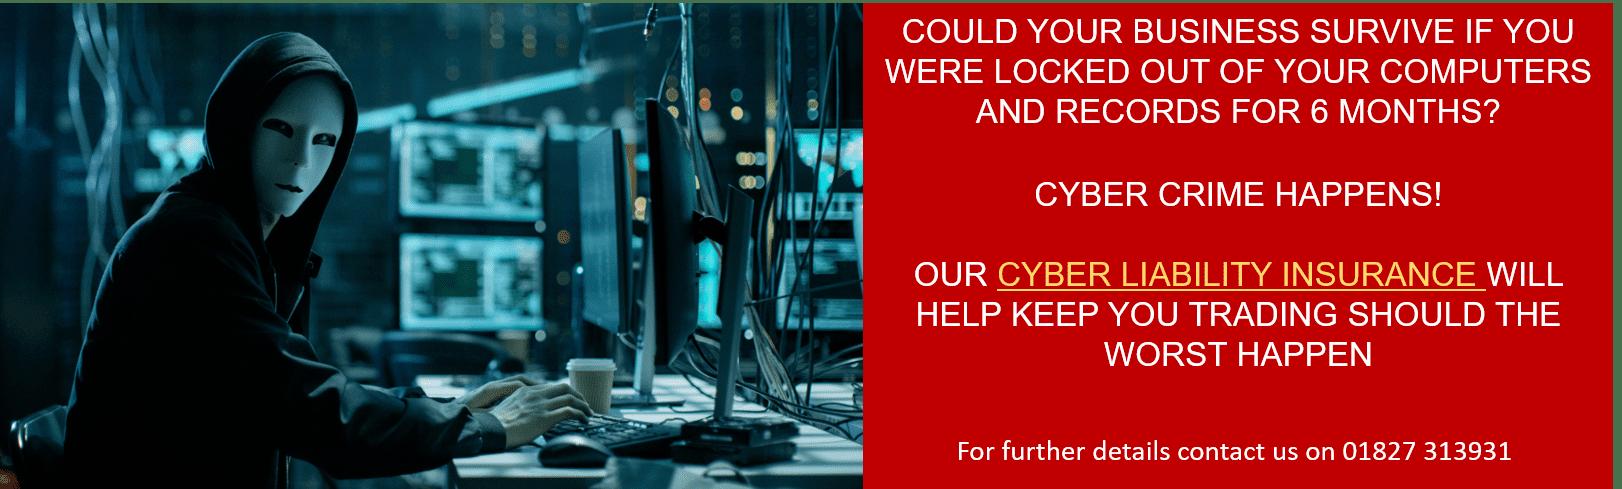 cyberbanner